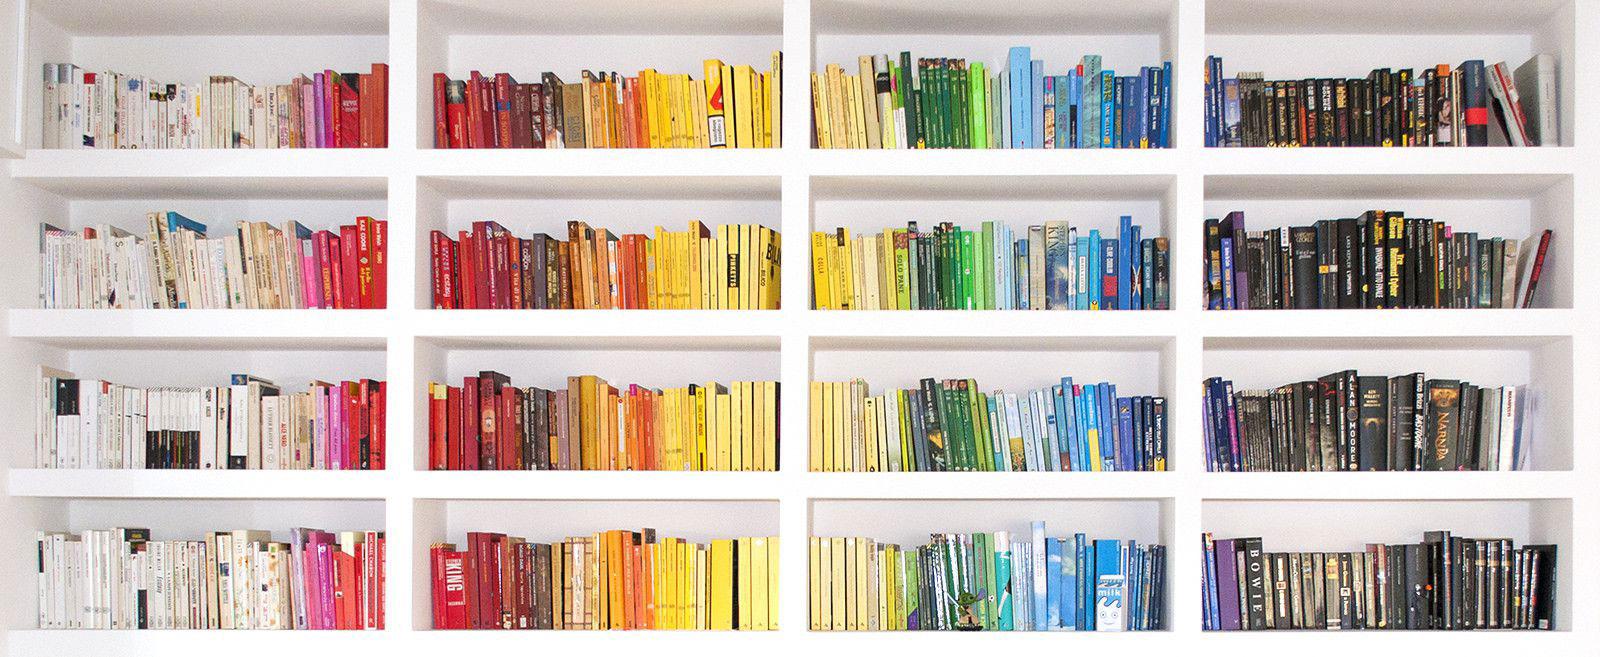 Biblioteca por colores